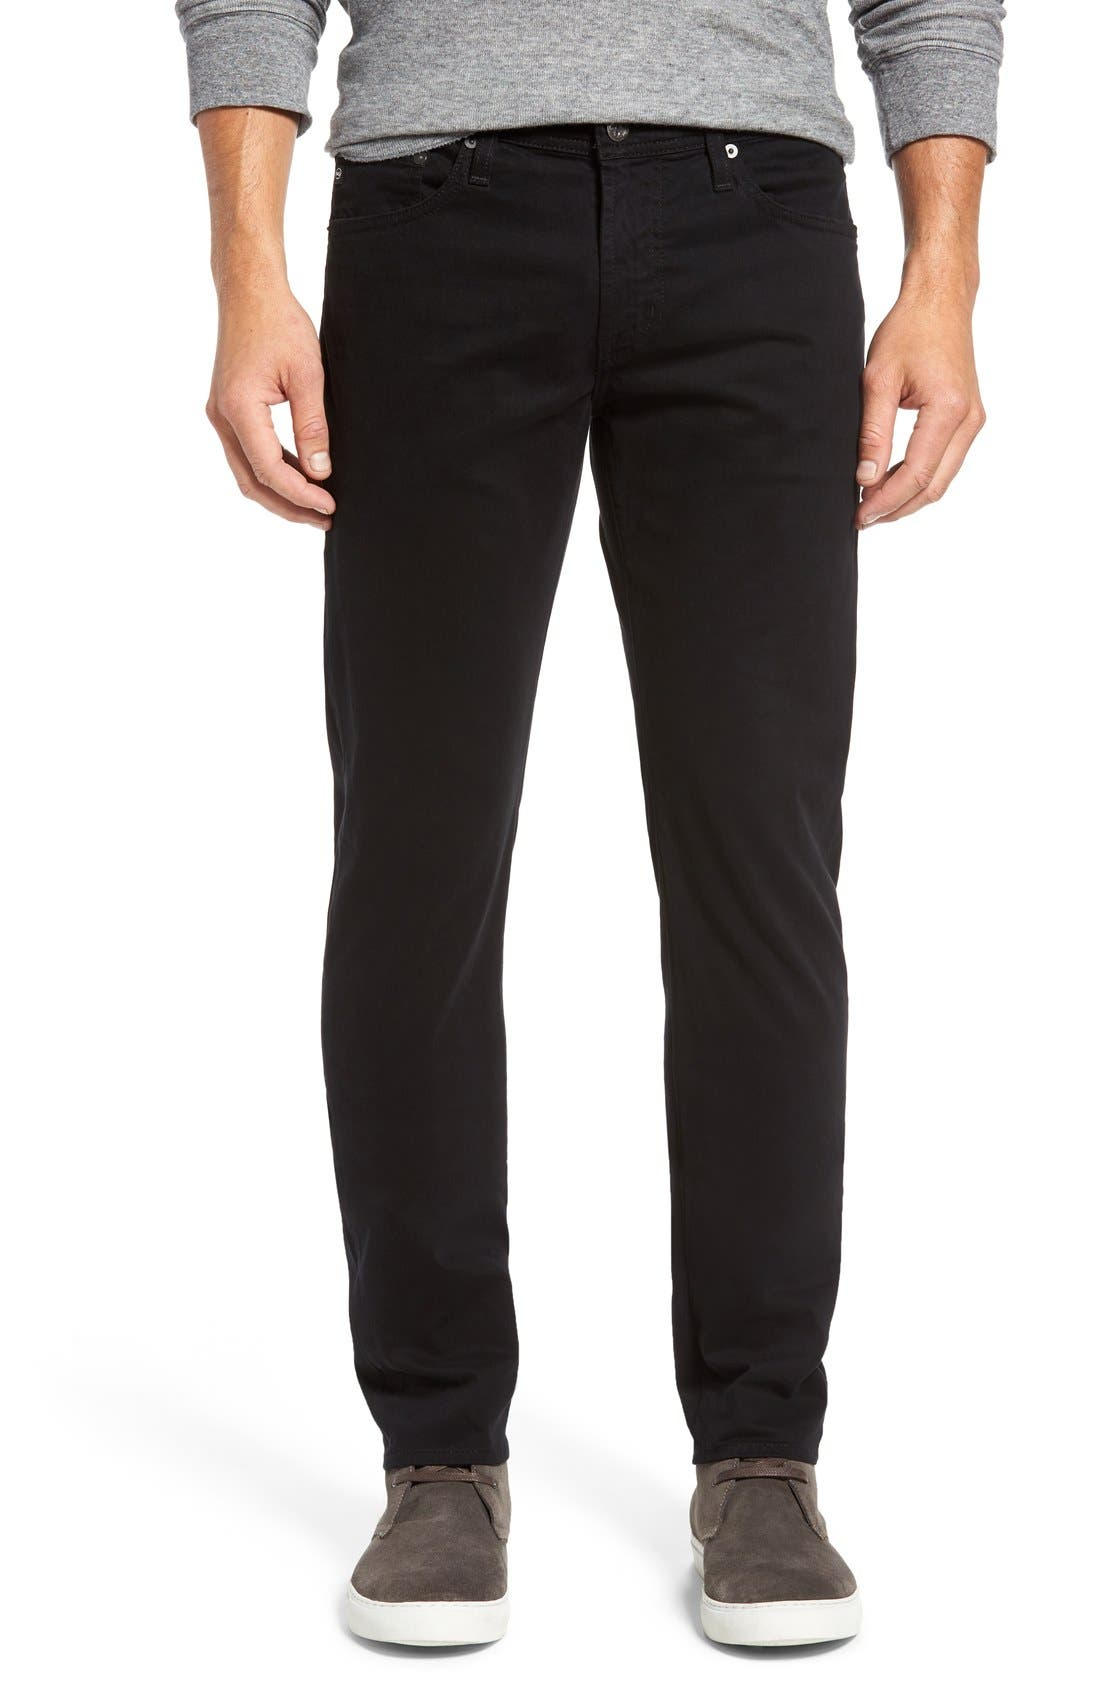 Dylan Slim Fit Pants,                         Main,                         color, 010